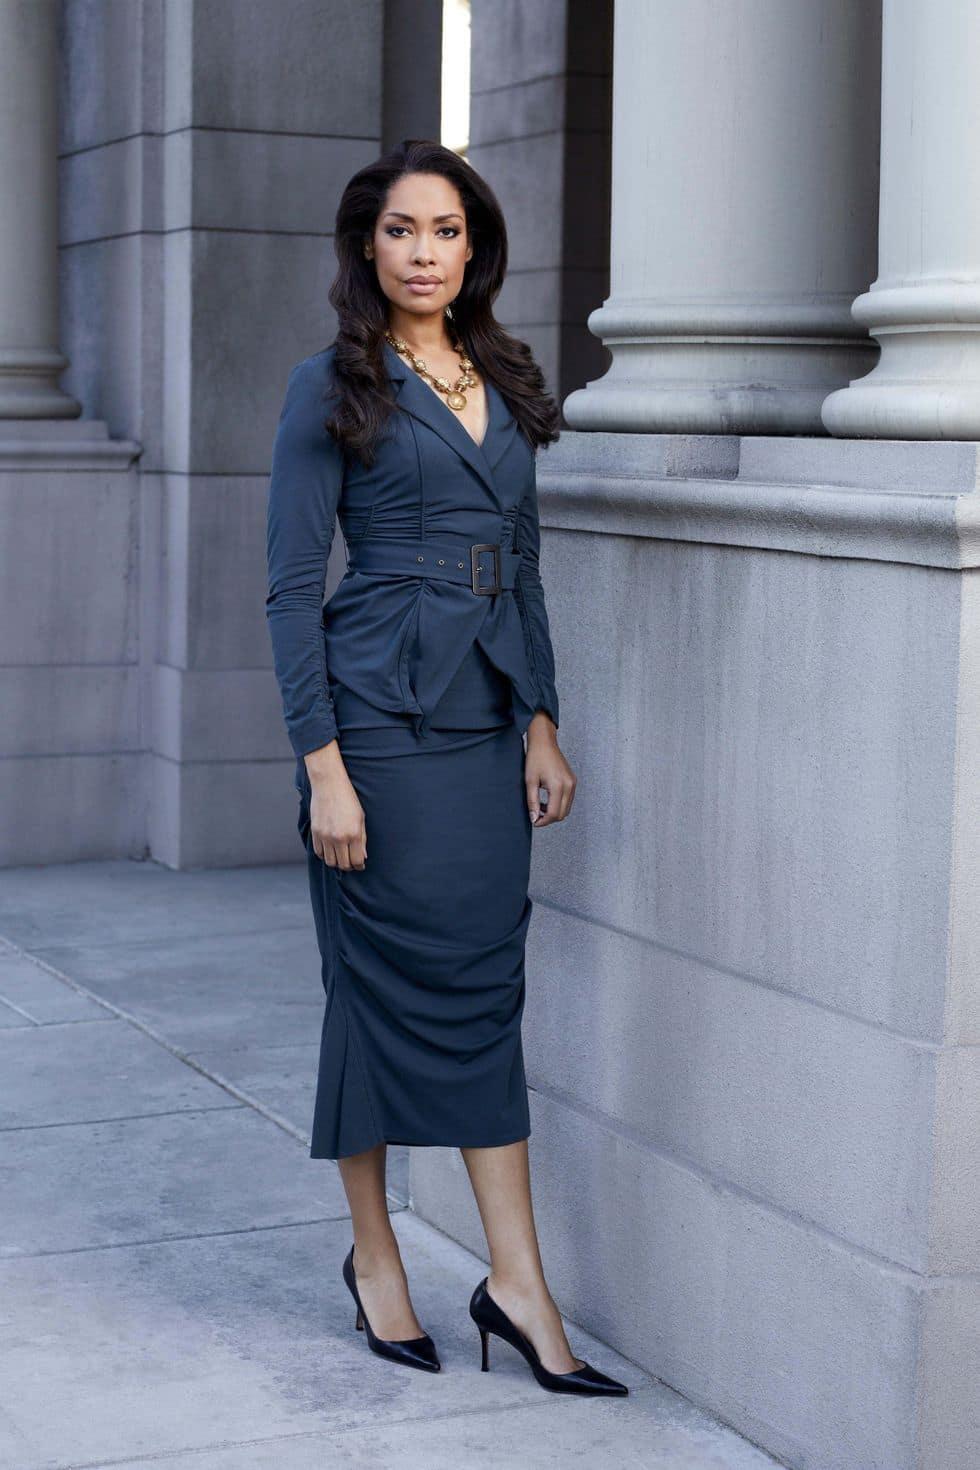 Gina Torres – Suits